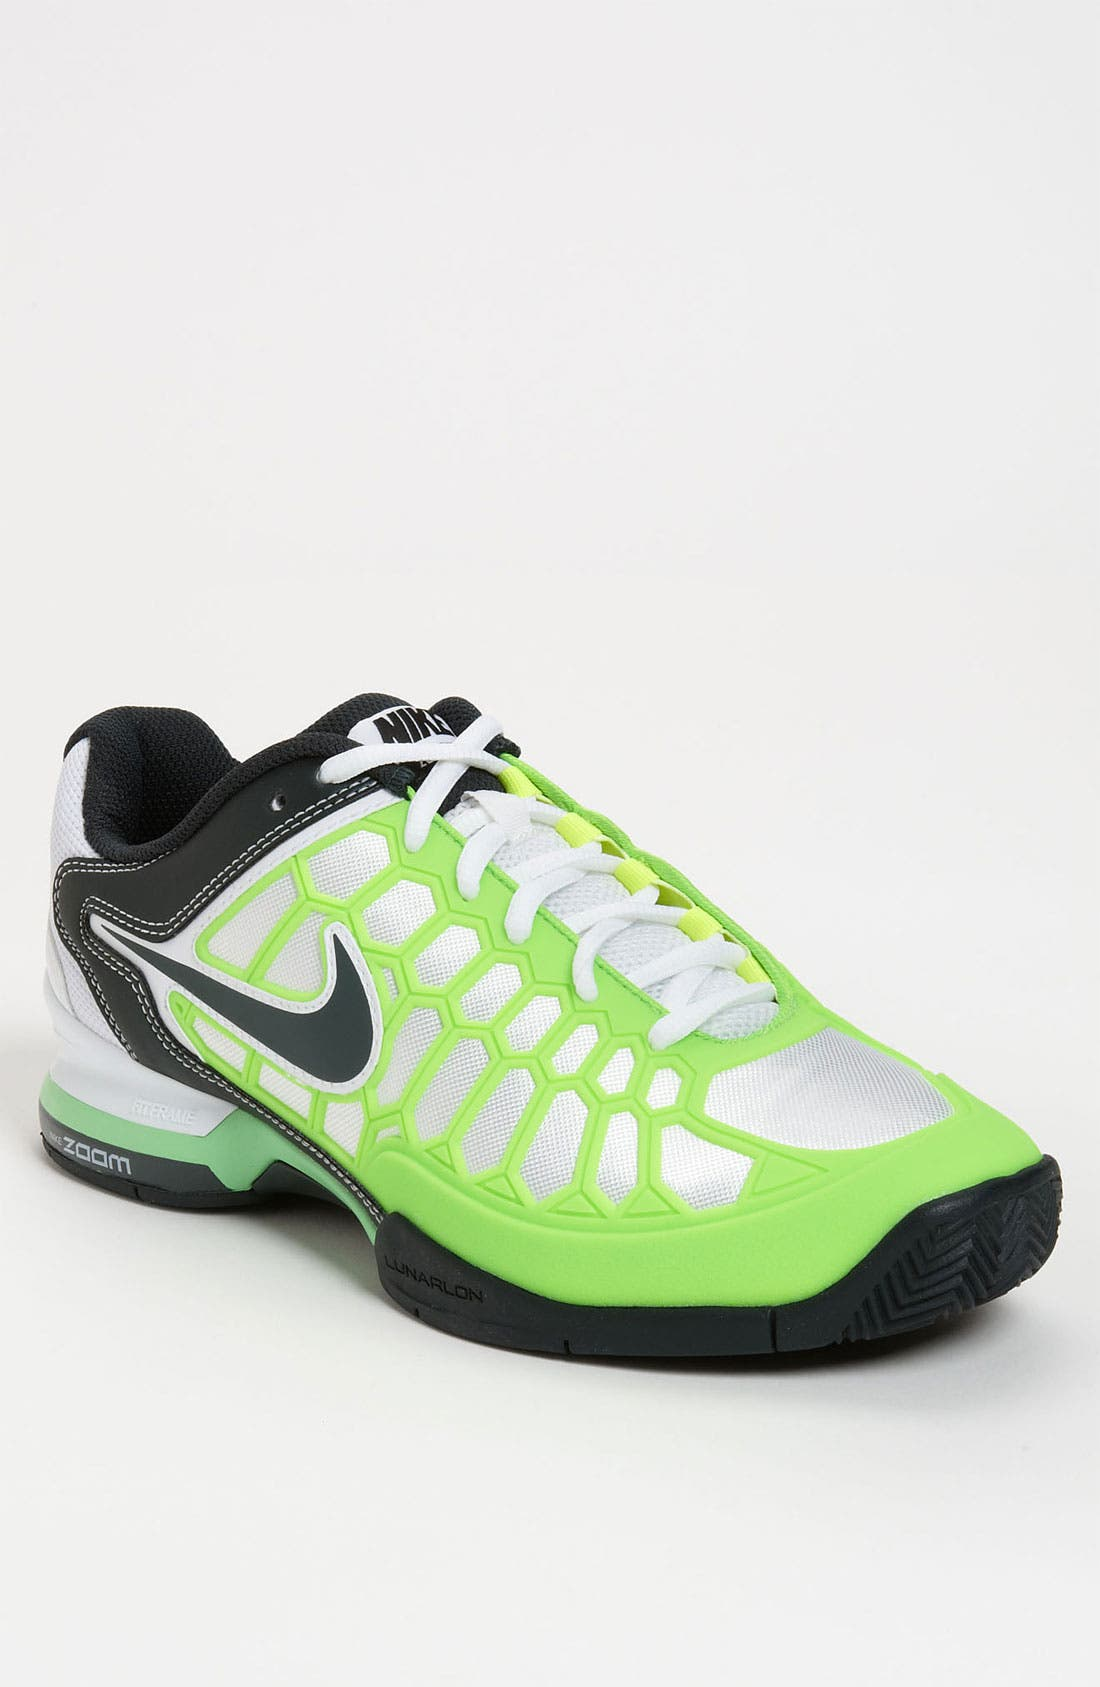 Alternate Image 1 Selected - Nike 'Zoom Breathe 2K12' Tennis Shoe (Men)